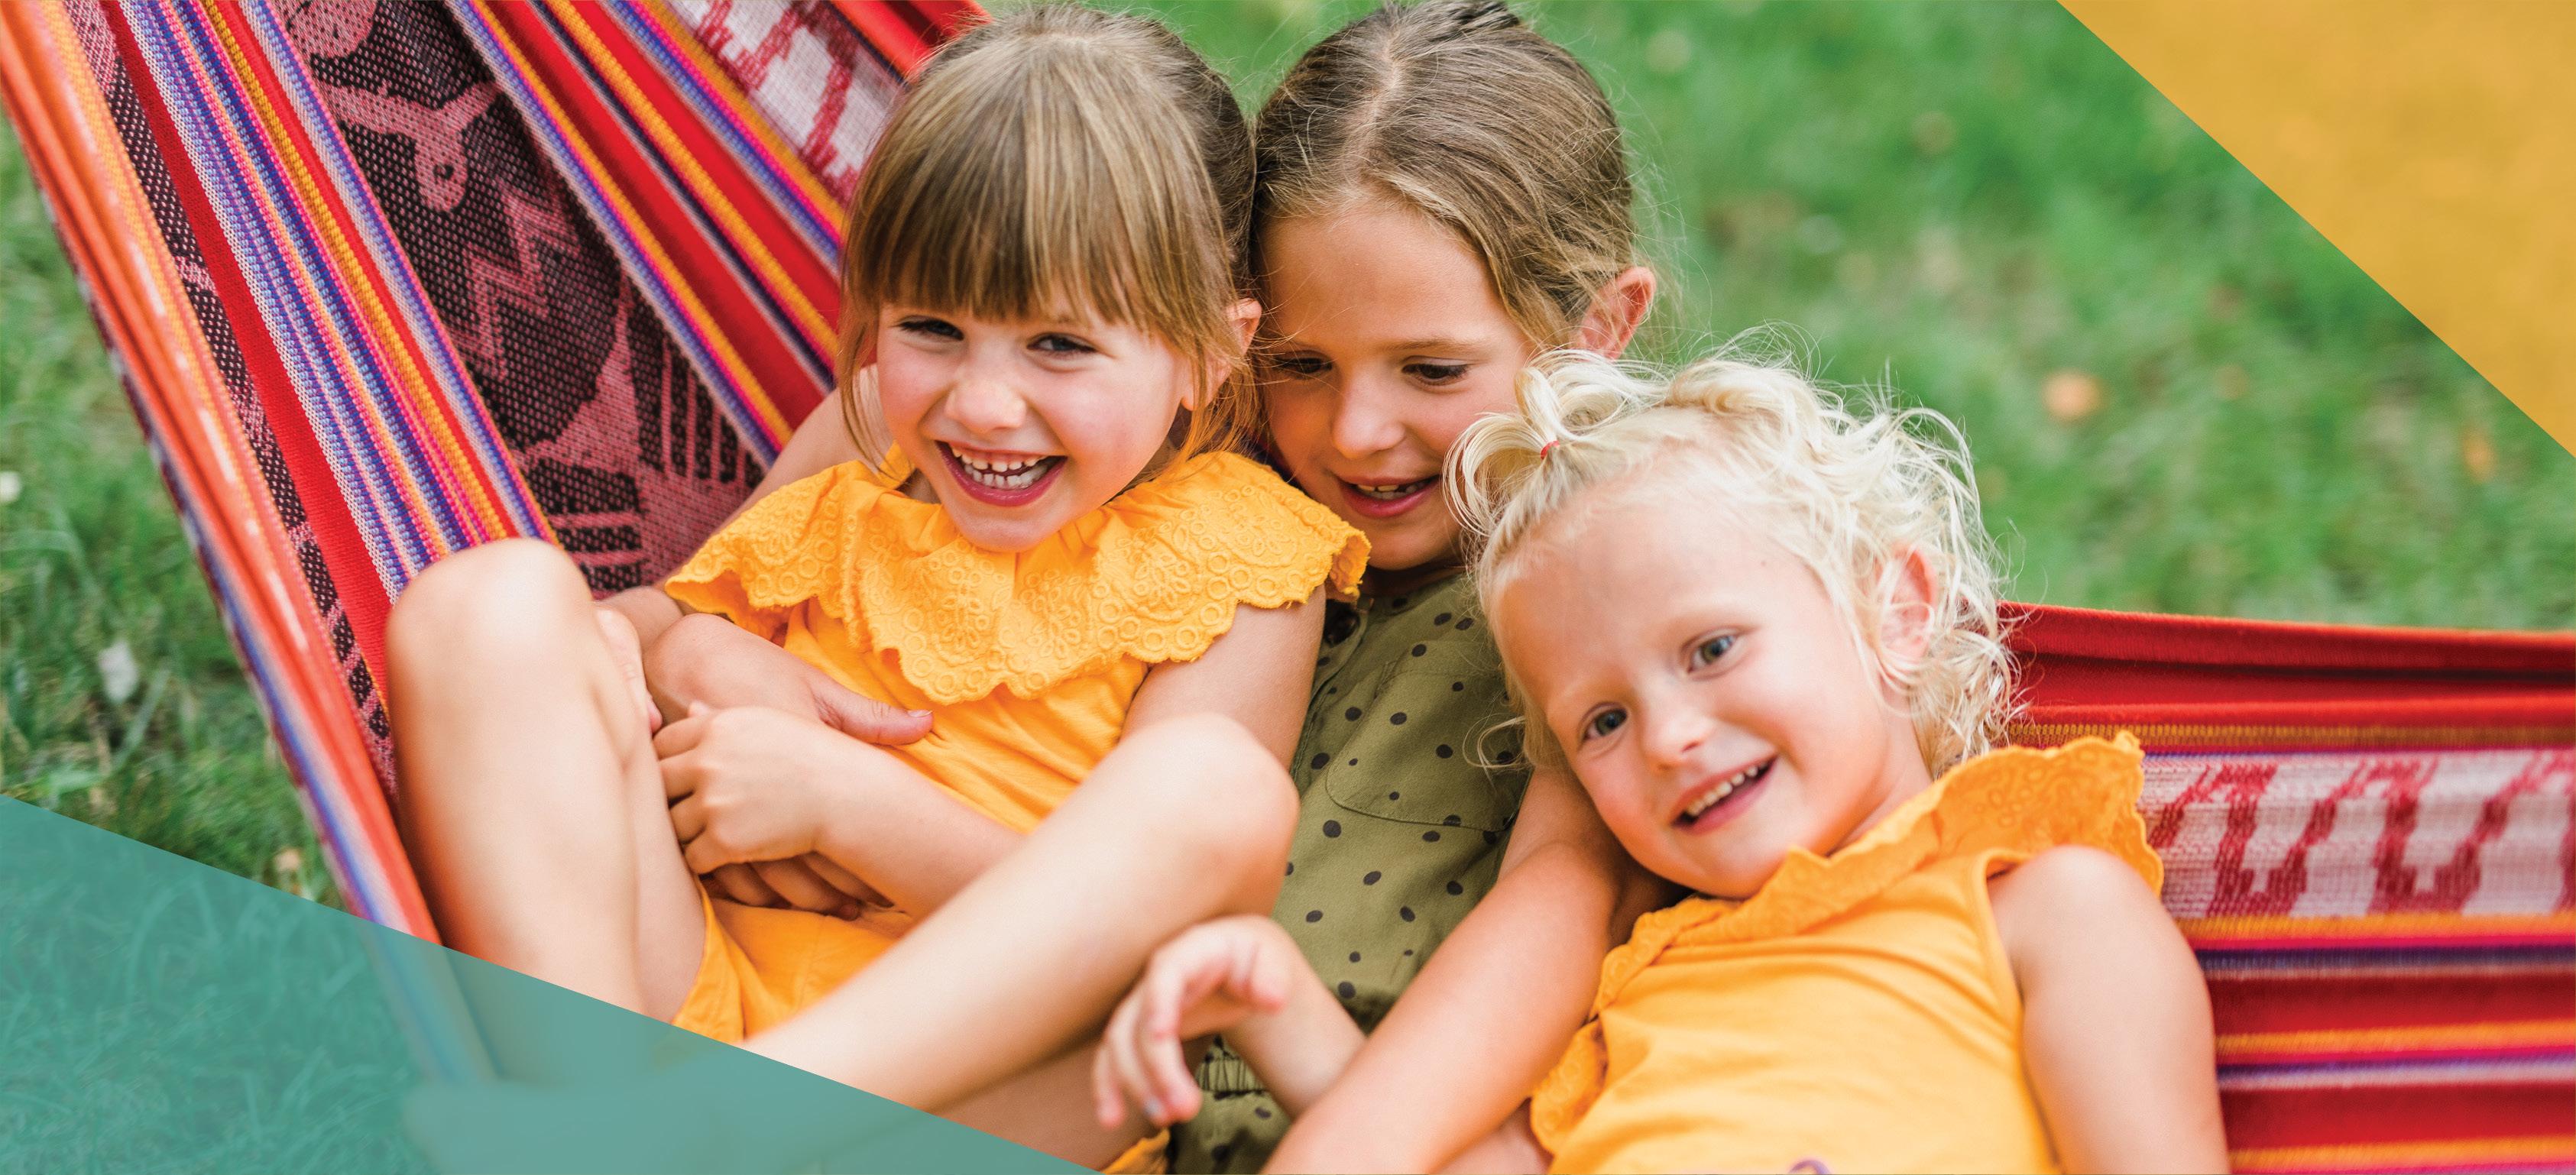 Foster Stories | Christian Heritage | Foster Care | Info Meeting | Lincoln Kearney Omaha Nebraska | Foster Care System | Foster Care Agencies | Foster Care Kinship | Foster Care Adoption | What is Foster Care